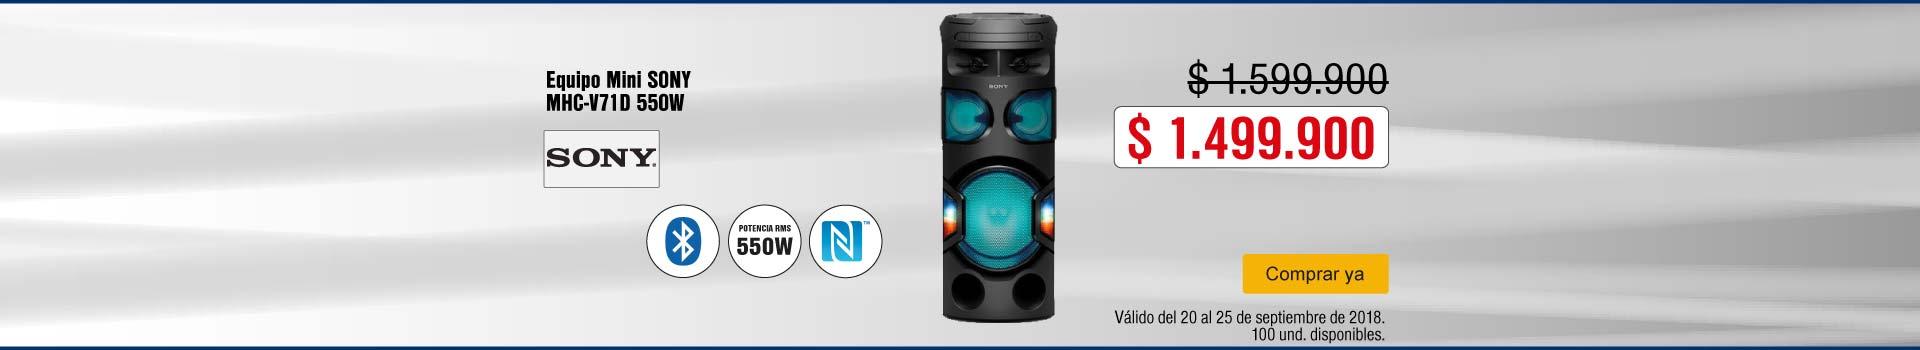 AK-KT-BCAT-5-audio-PP---Sony-MHC-V71D-Sep22